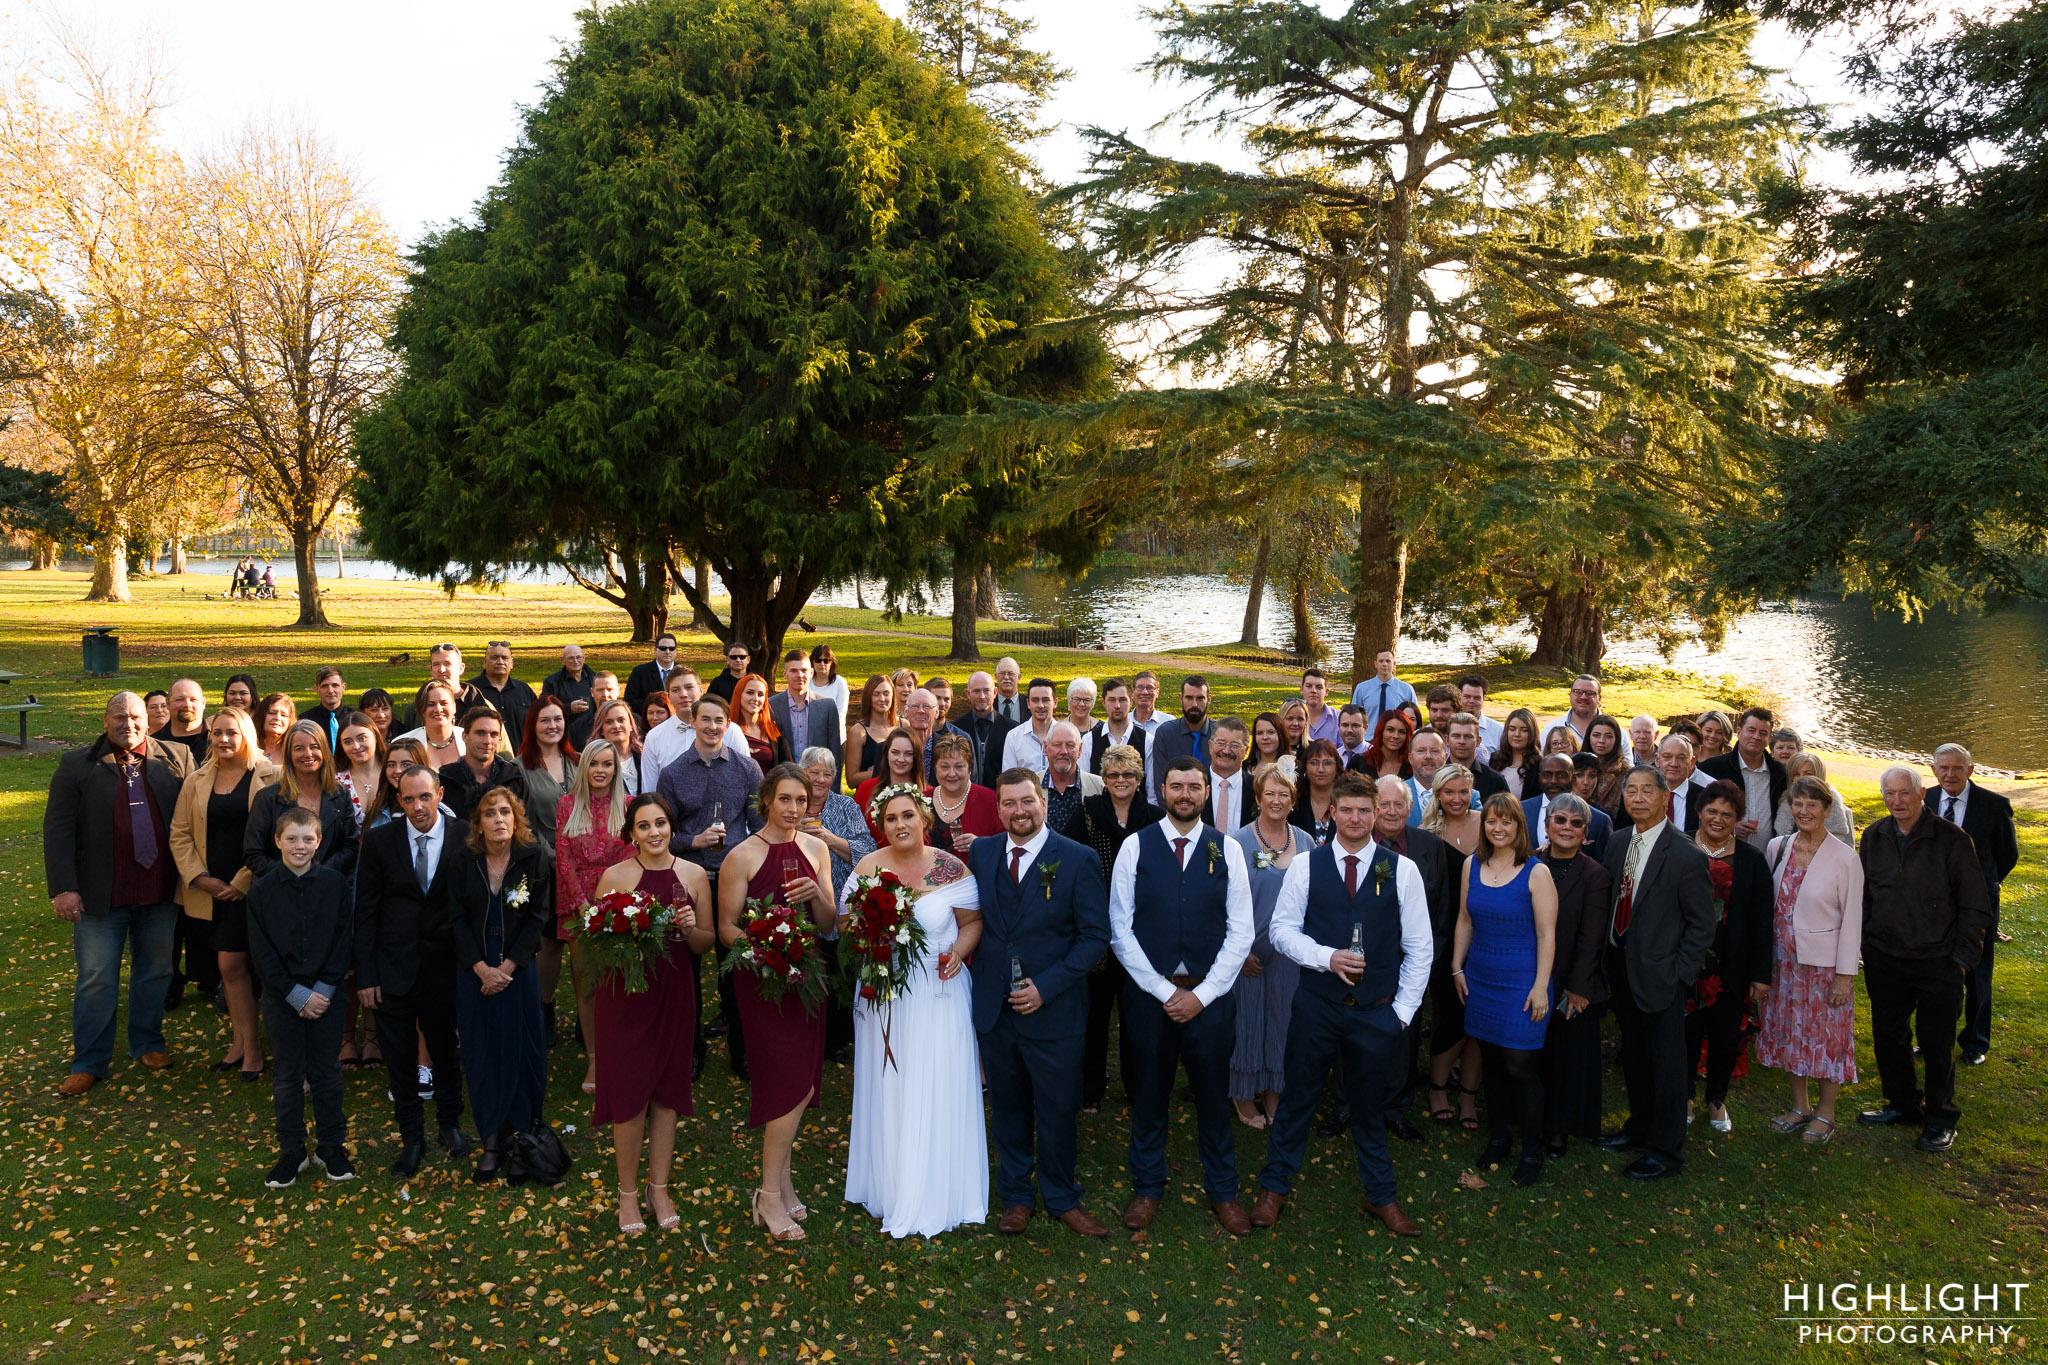 Highlight-wedding-photography-new-zealand-palmerston-north-66.jpg